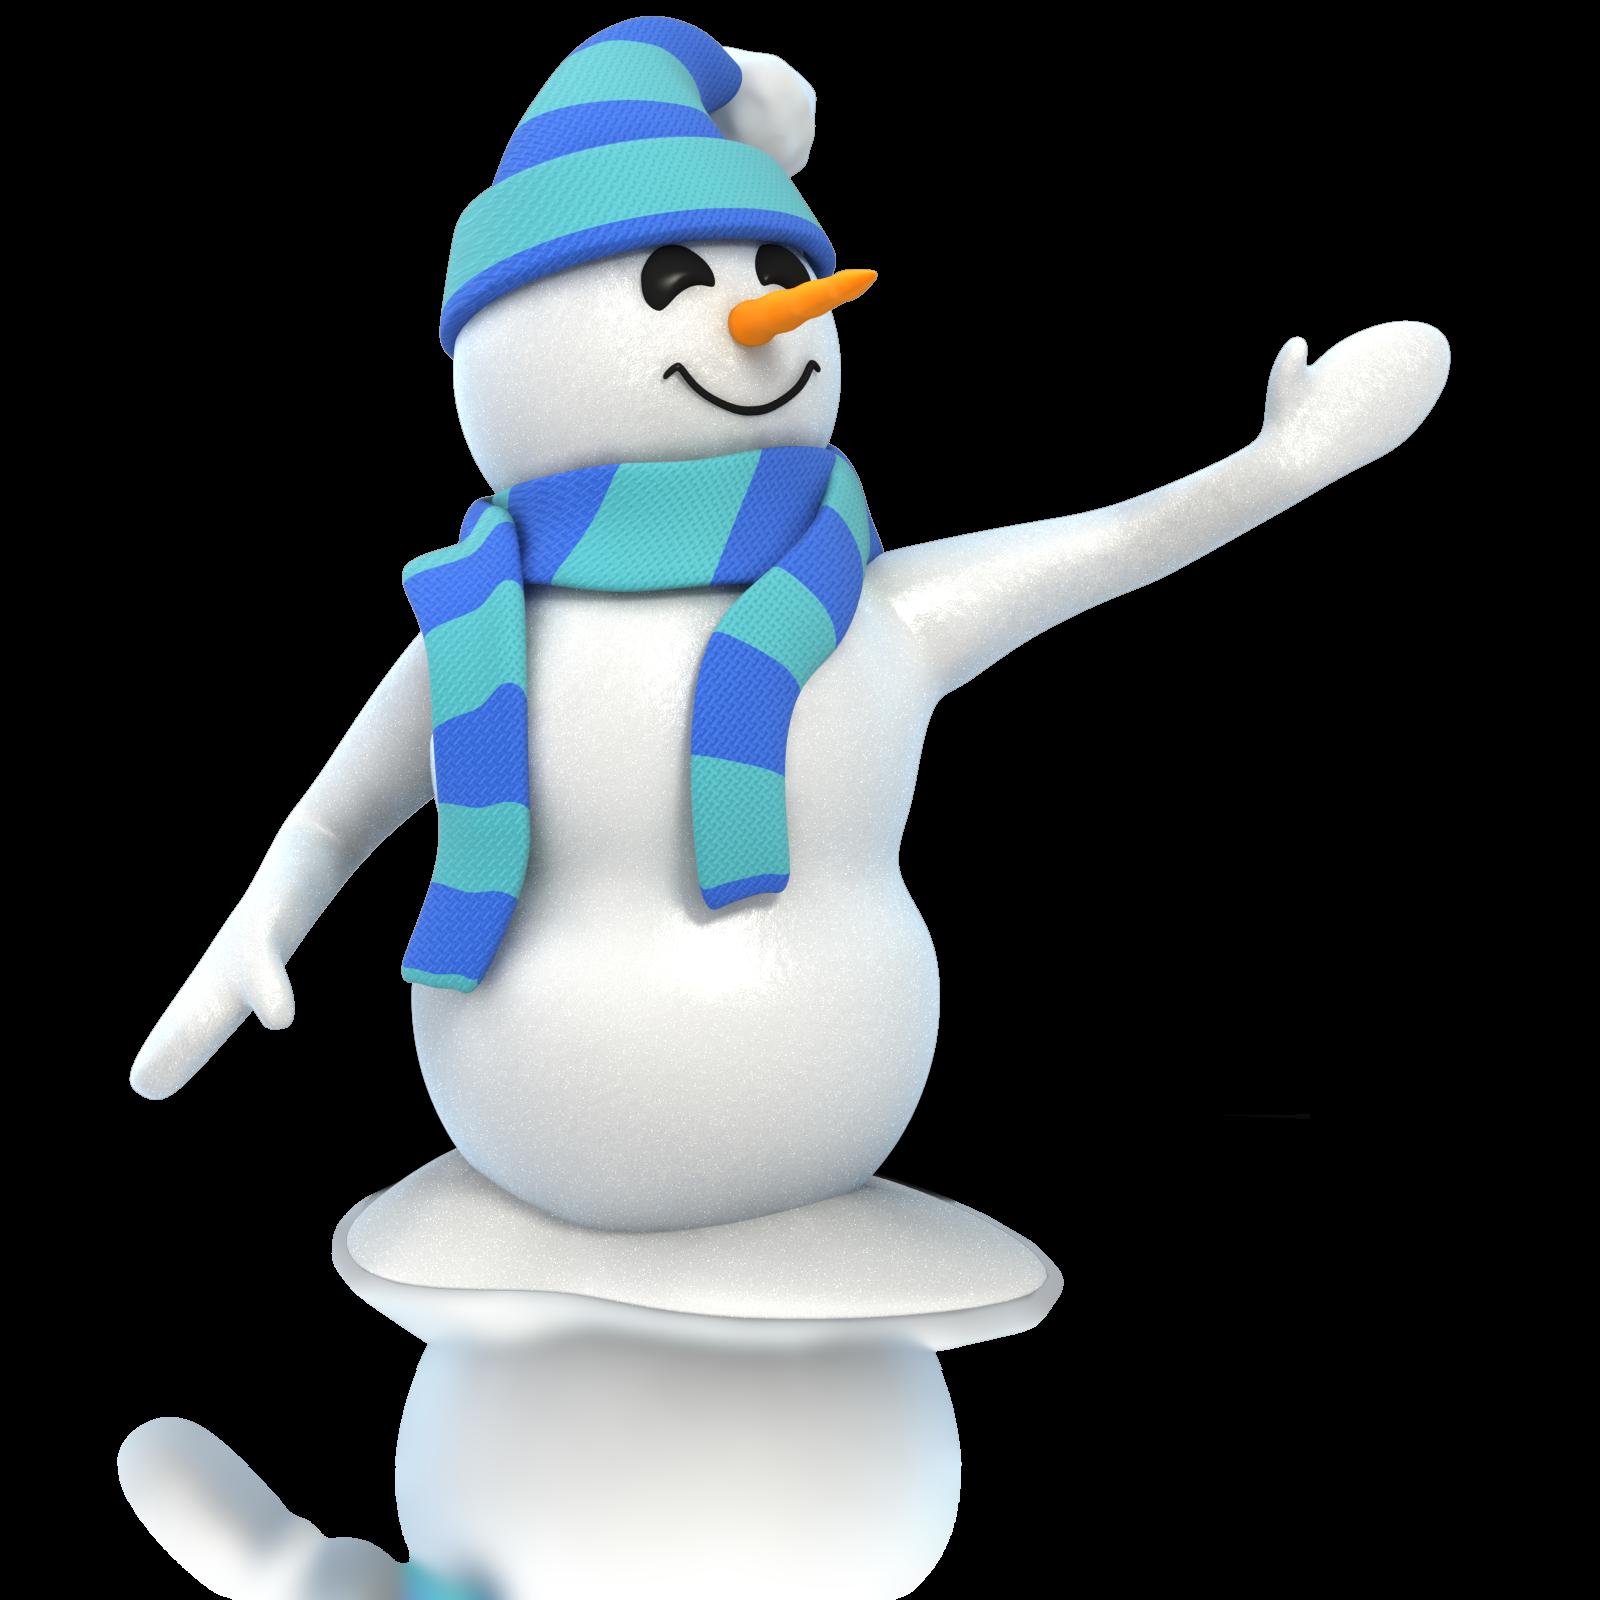 Snowman PNG - 11613